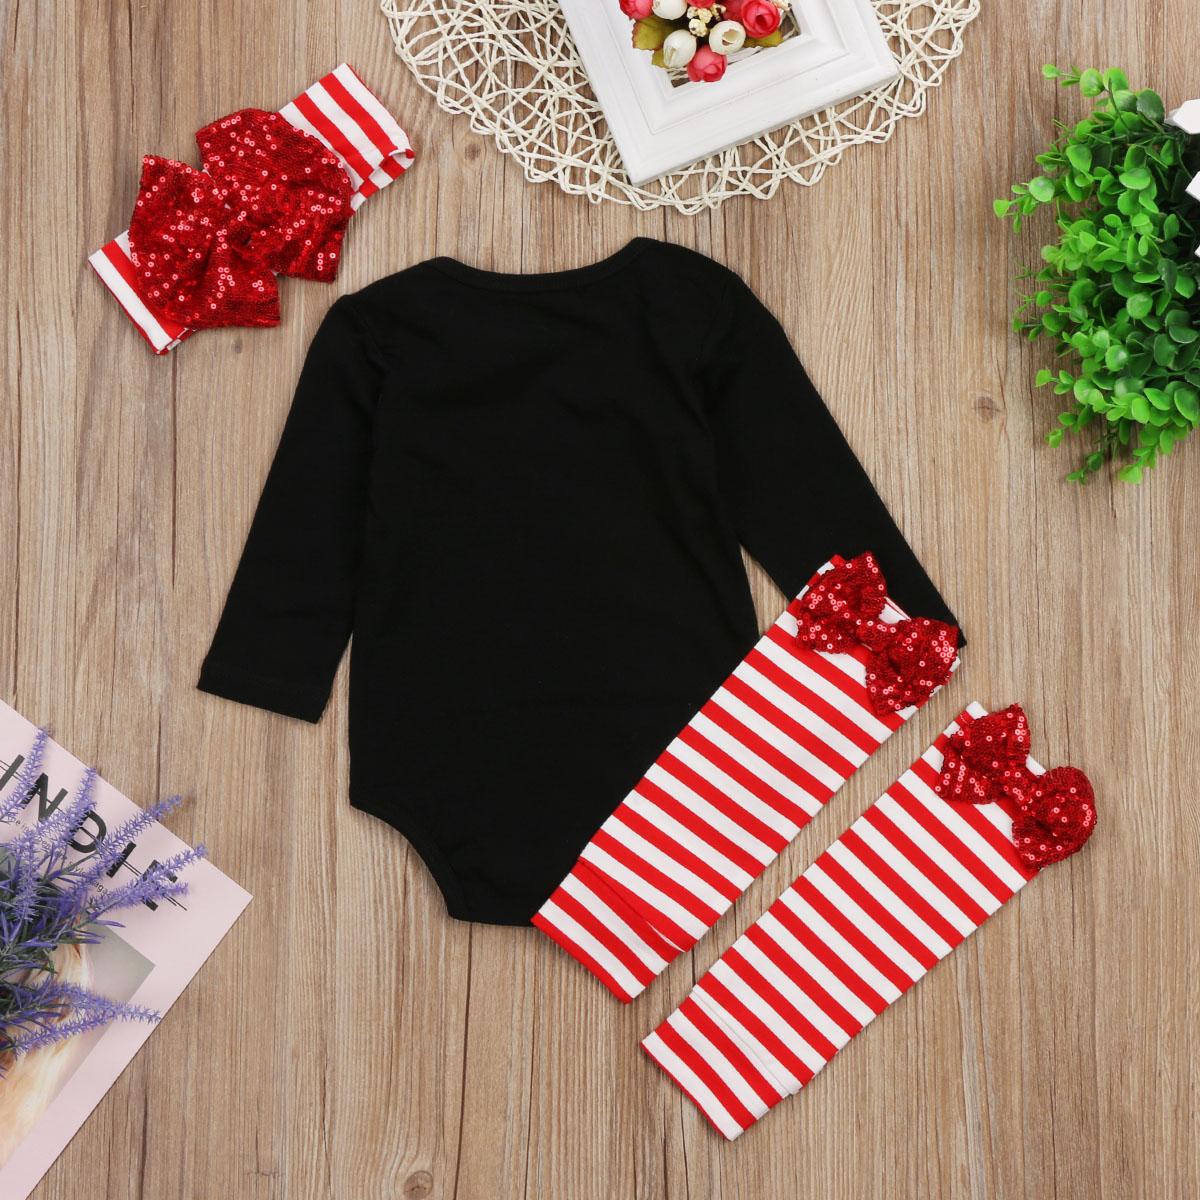 Christmas Xmas Santa Baby Clothes Adorable Girls Long Sleeve Romper